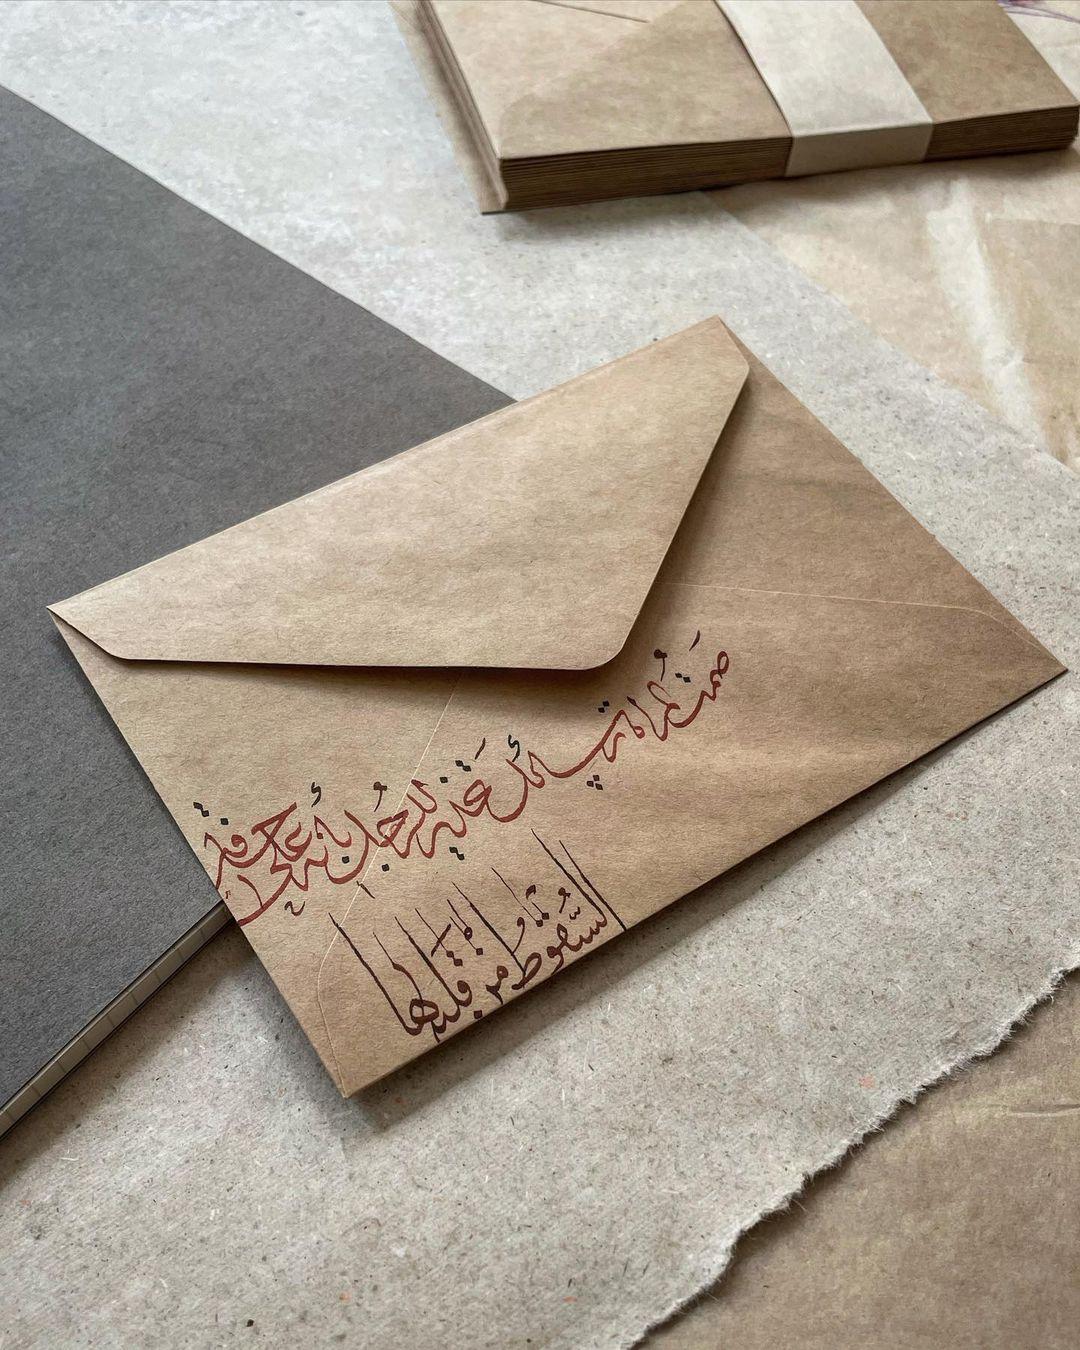 Karya Kaligrafi خذ بالك .. صمت المرأة رسائل تحذير للرجل بأنه على حافة السقوط من قلبها – هل هذ…- jasssim Meraj